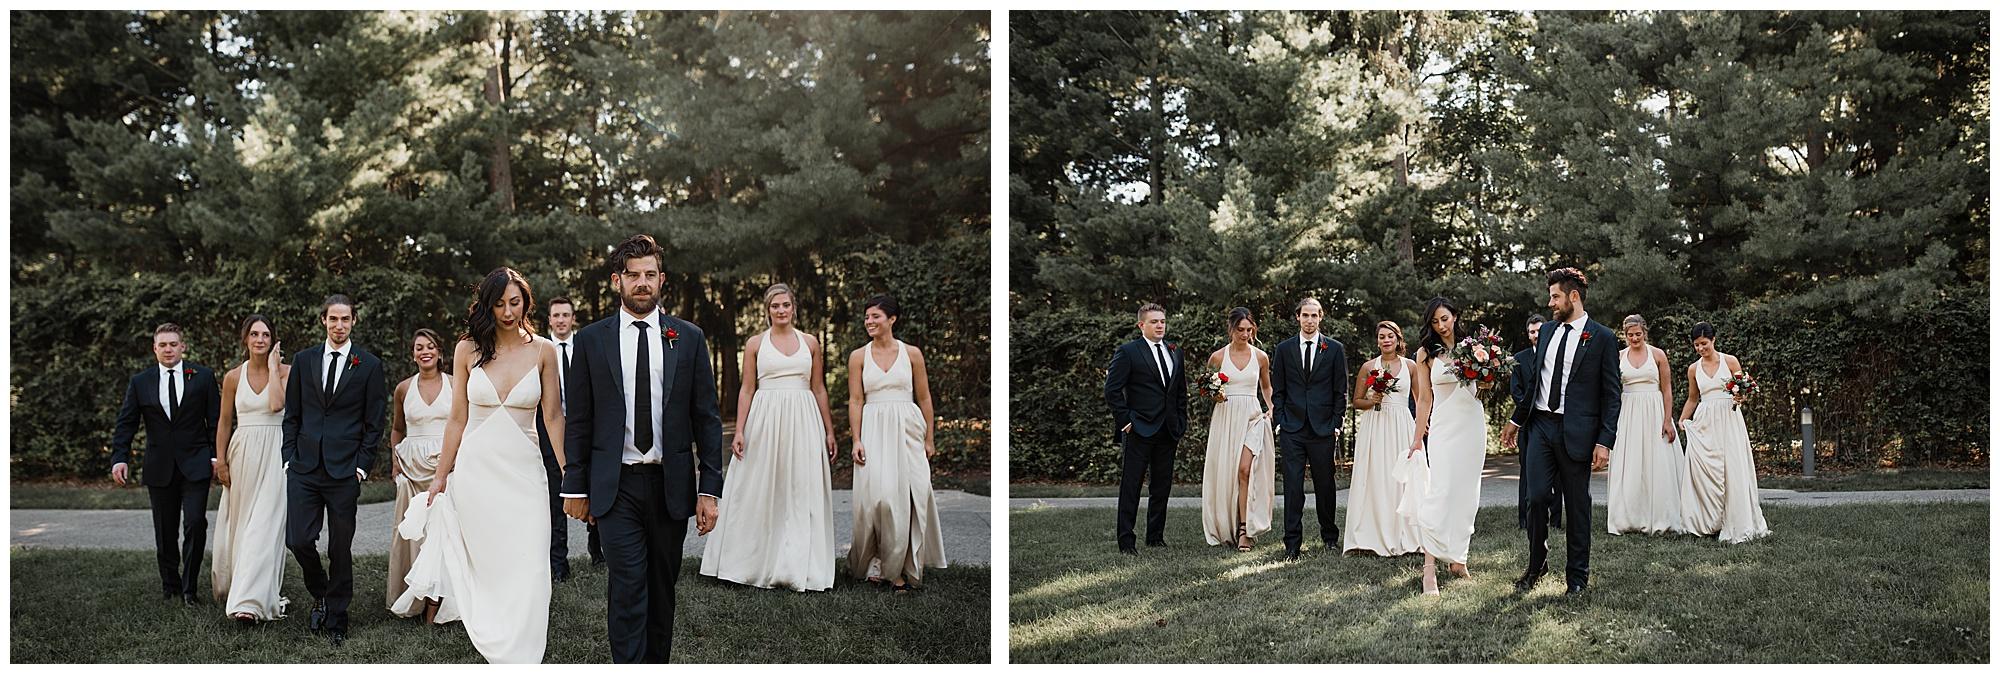 allerton_park_wedding_champaign_il_chicago_wright_photographs_ne_0027.jpg